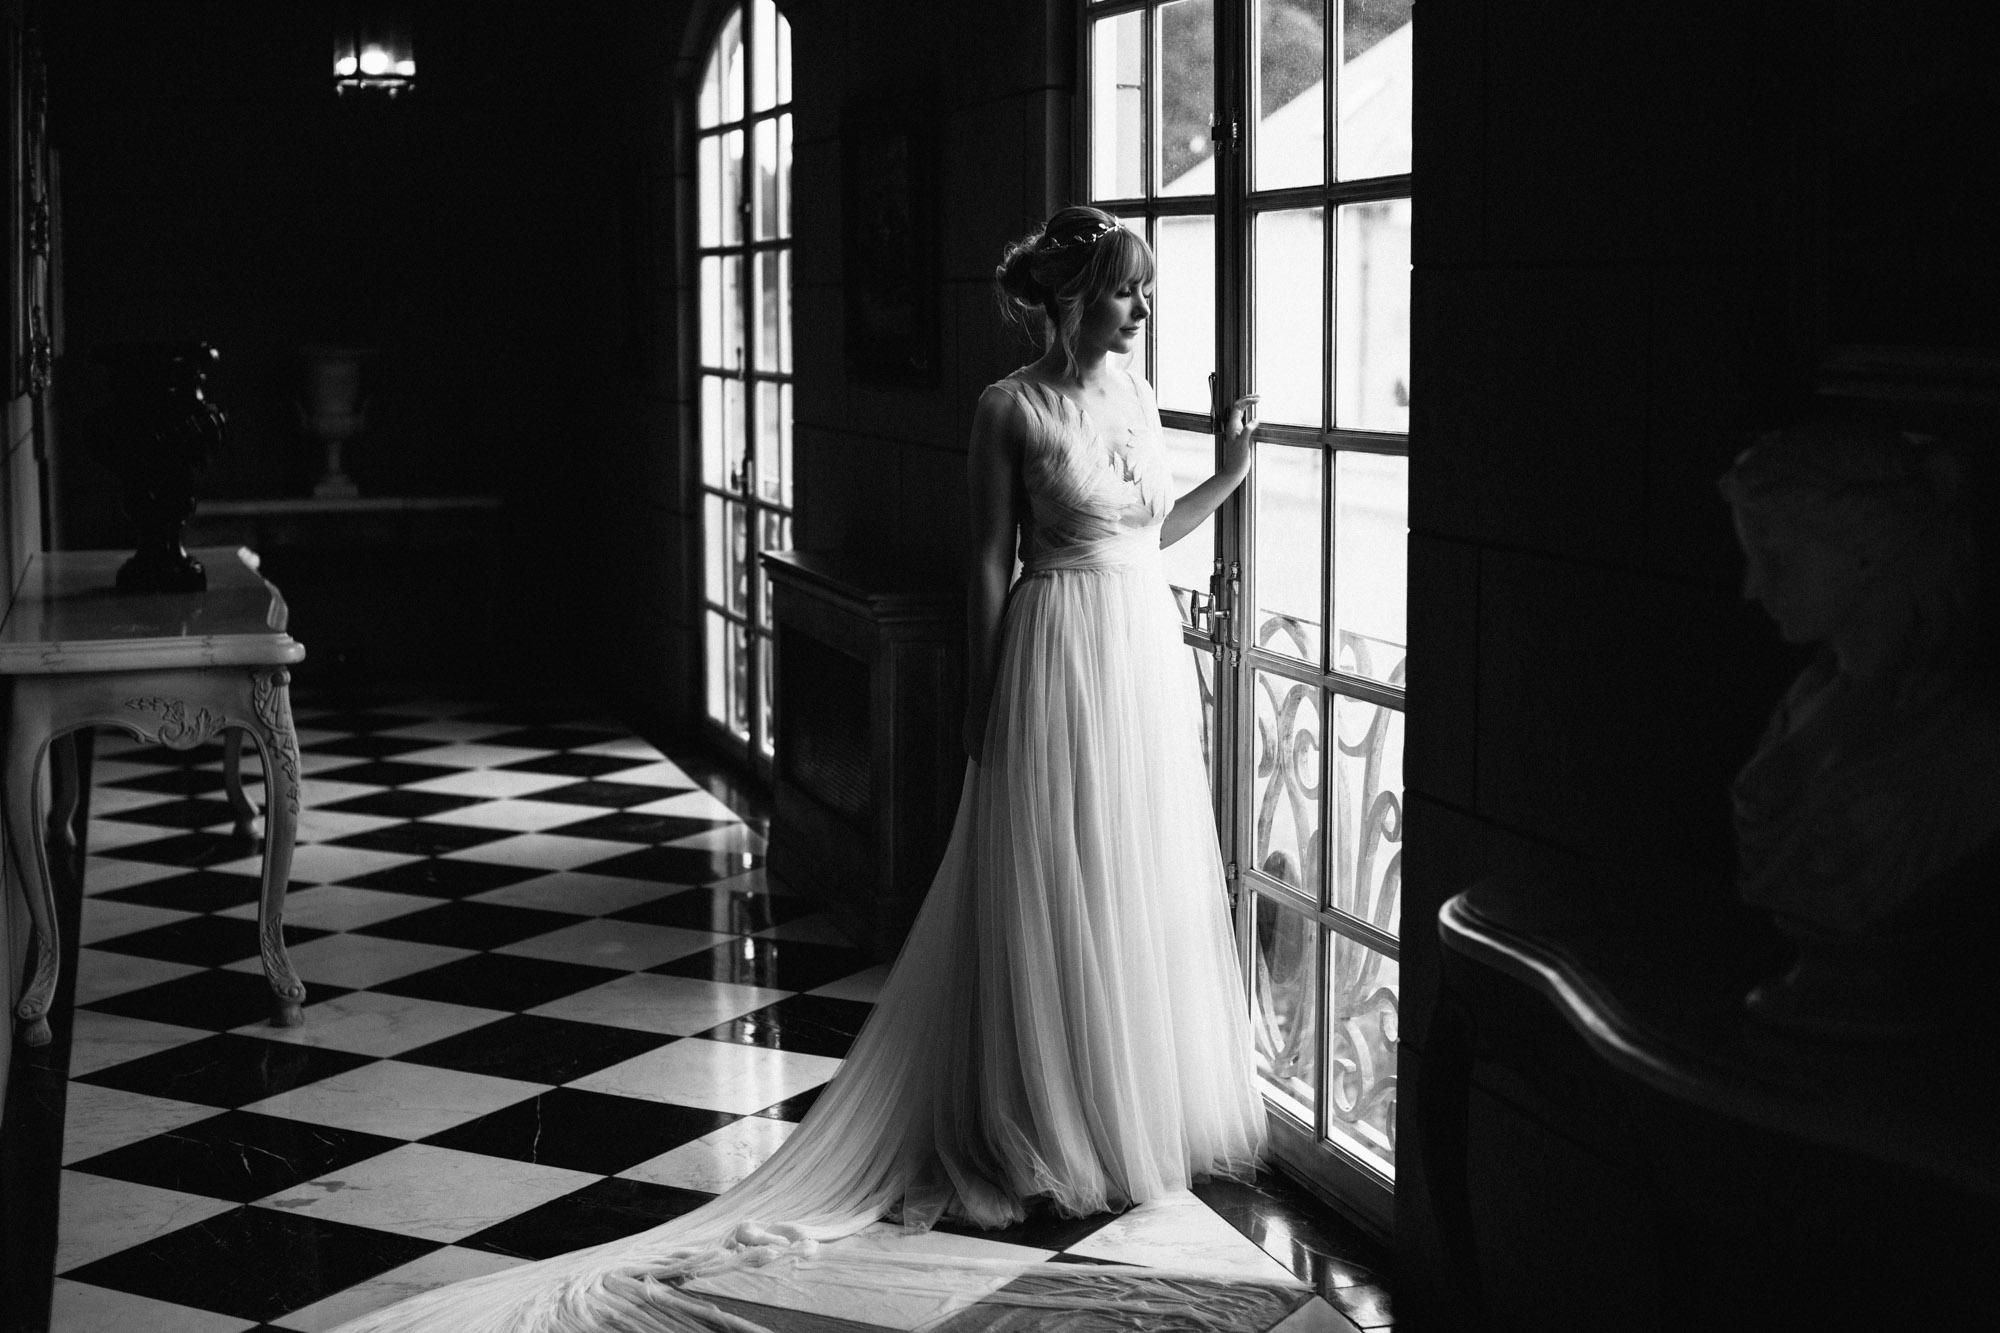 Campbell Point House Wedding HJ + Dean Raphael Weddings-114.jpg